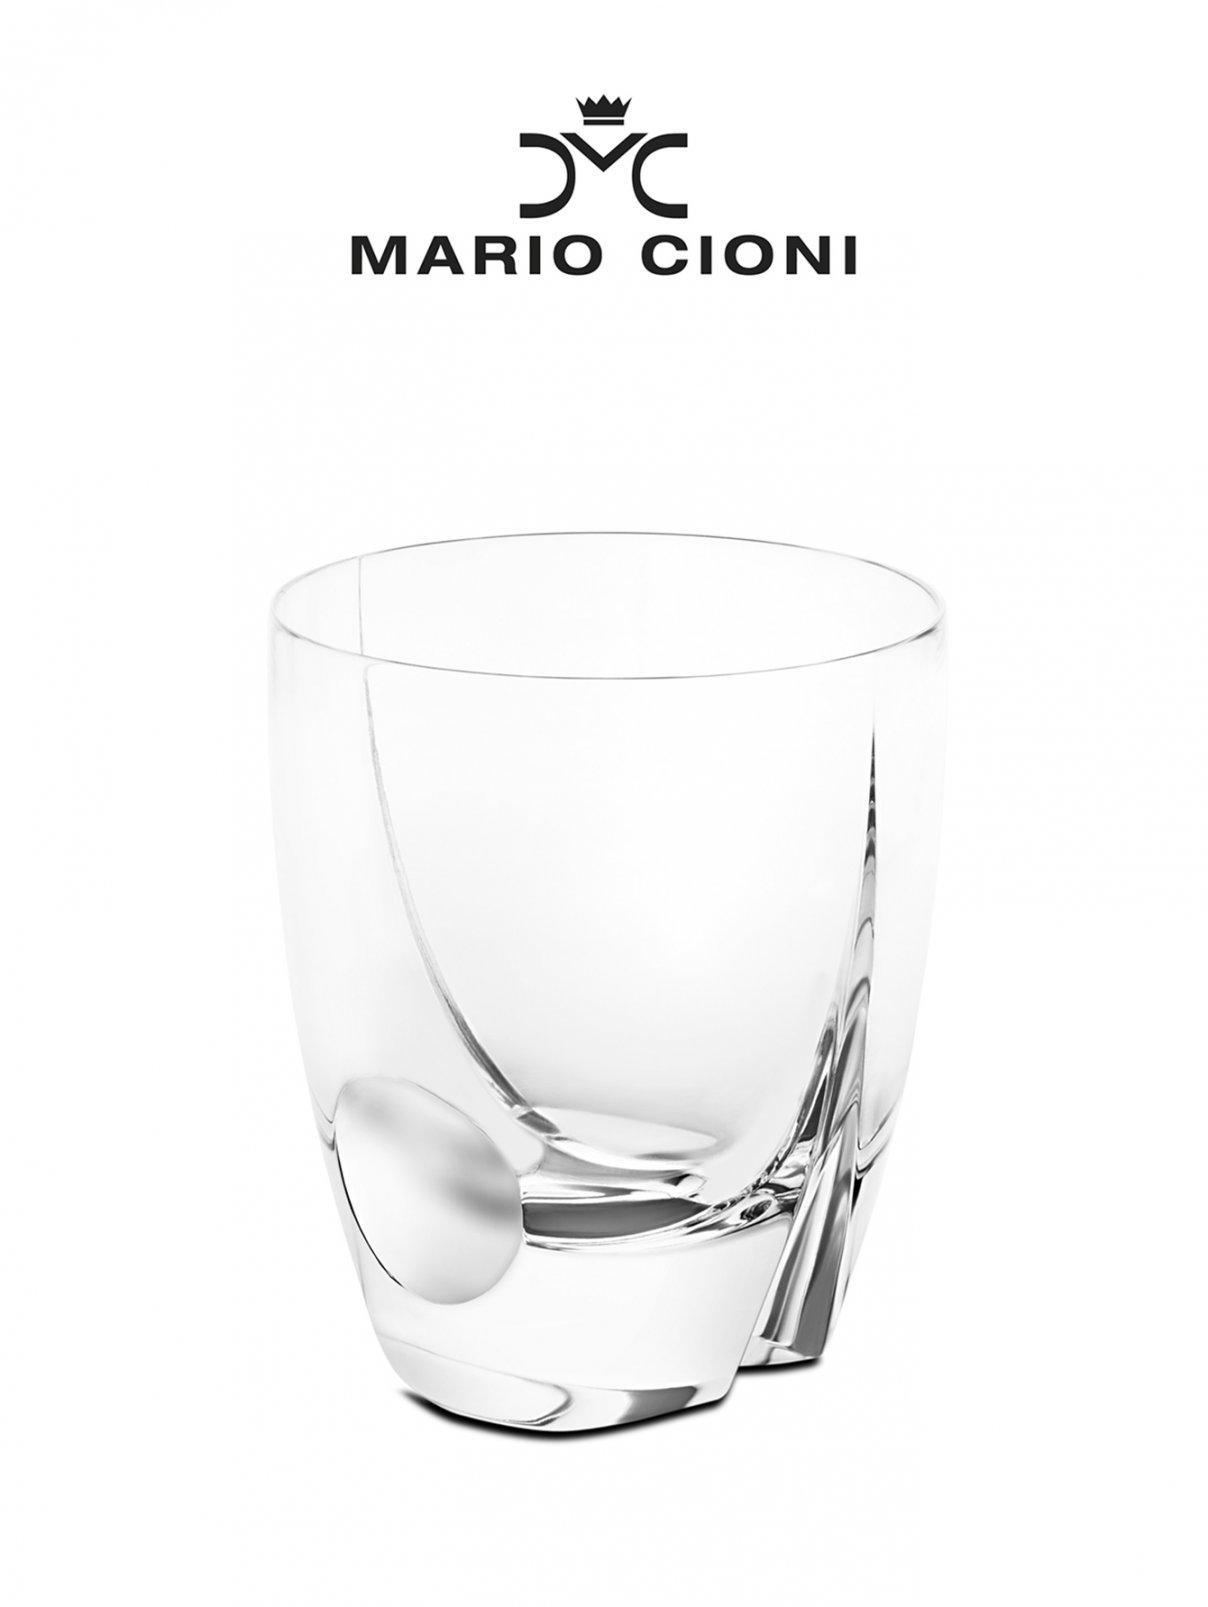 Бокал для виски 10 см Mario Cioni  –  Общий вид